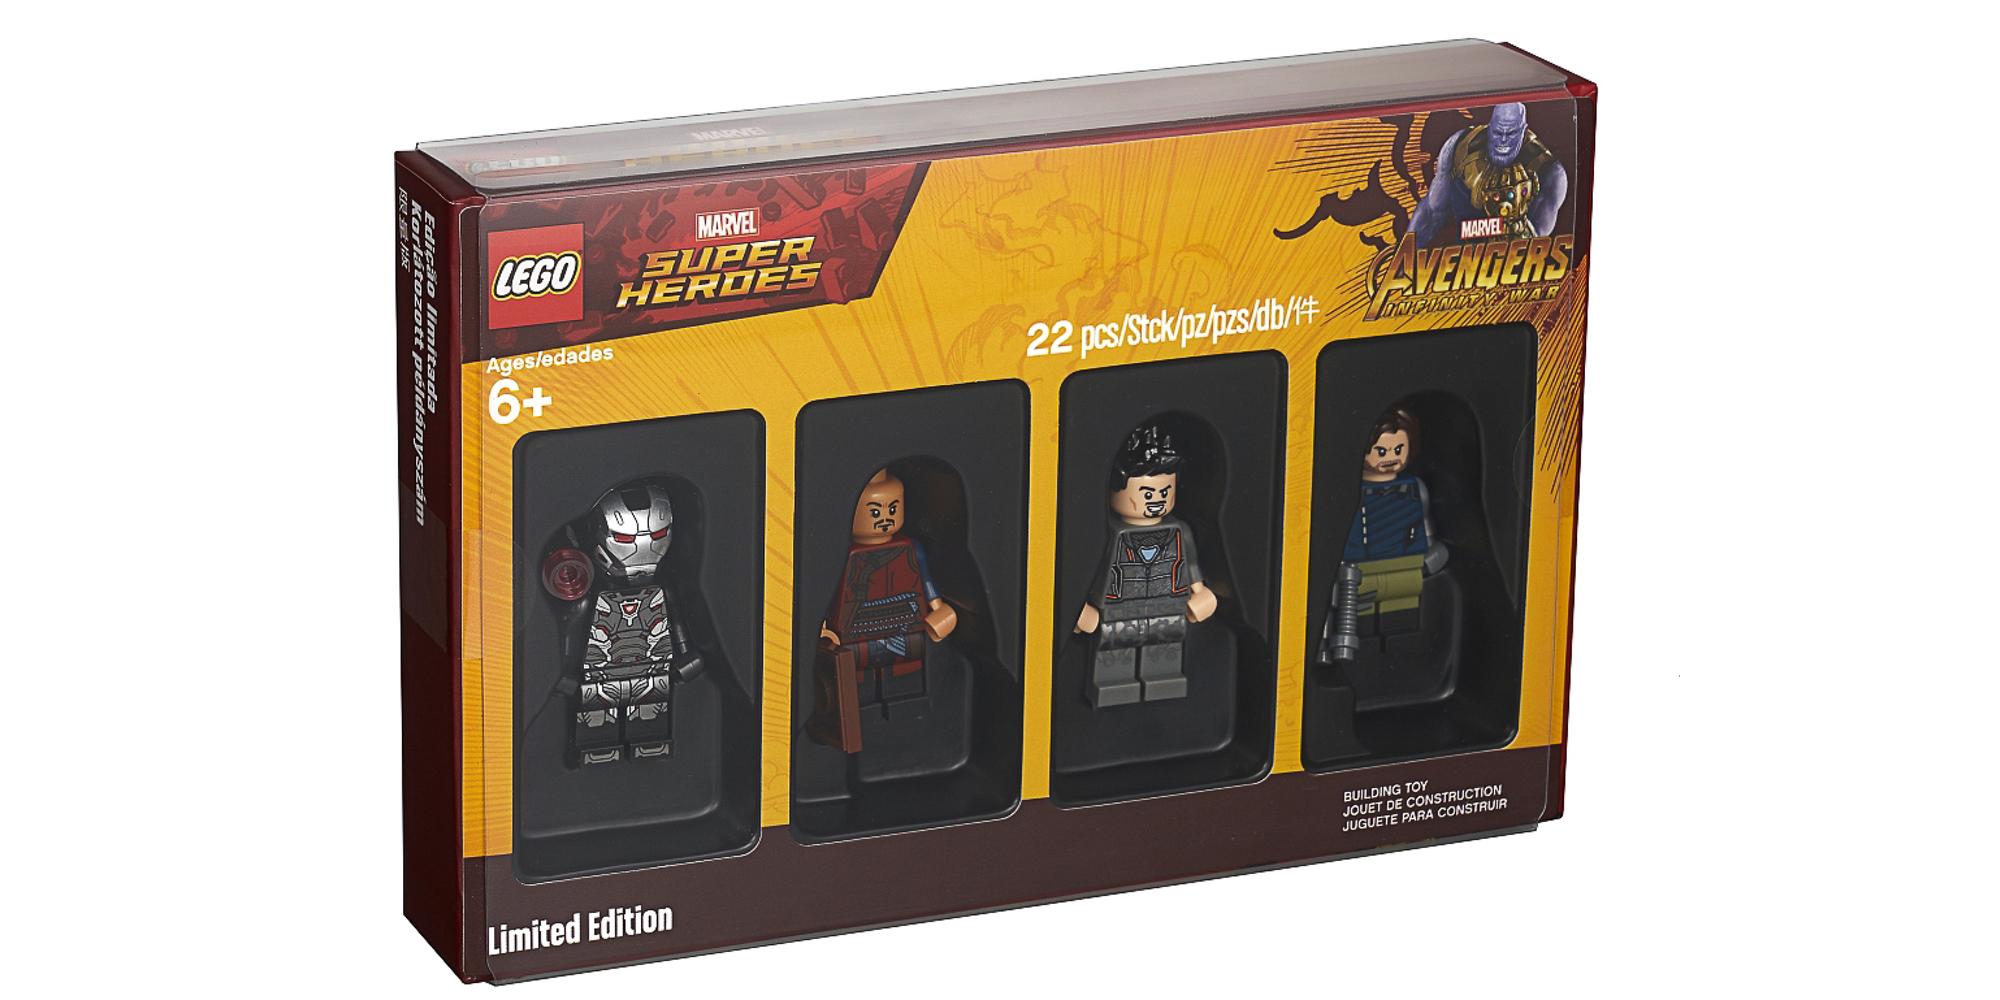 LEGO Avengers Minifigure Pack Box Art